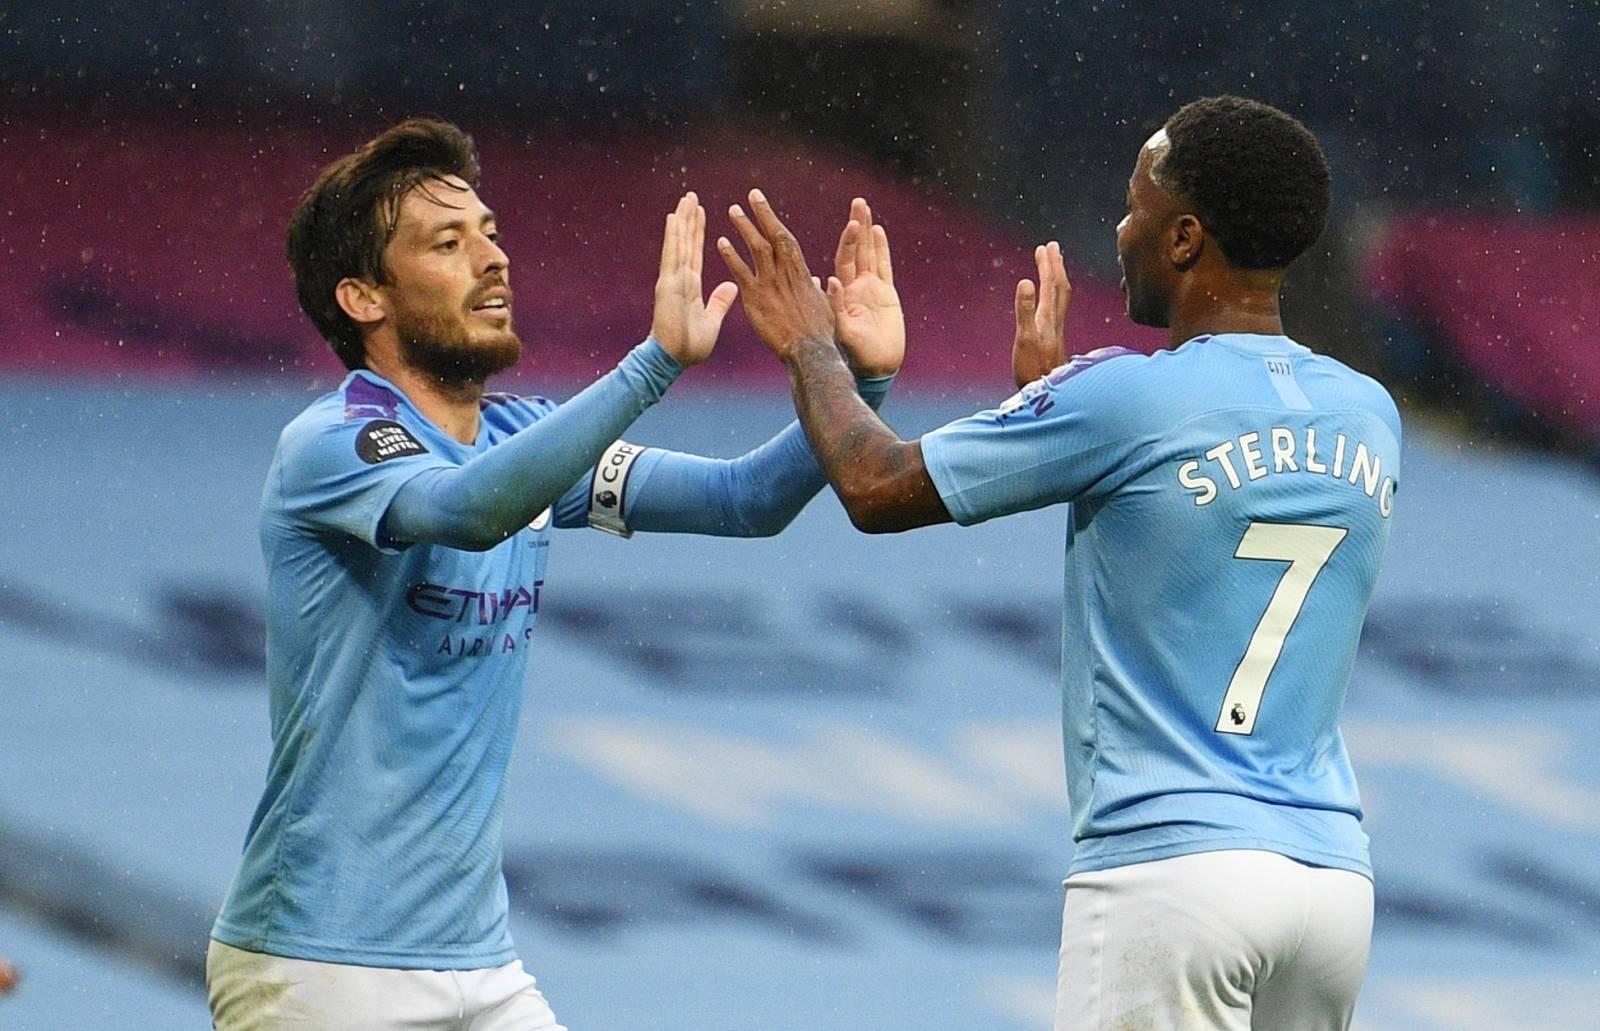 Premier League - Manchester City v Newcastle United